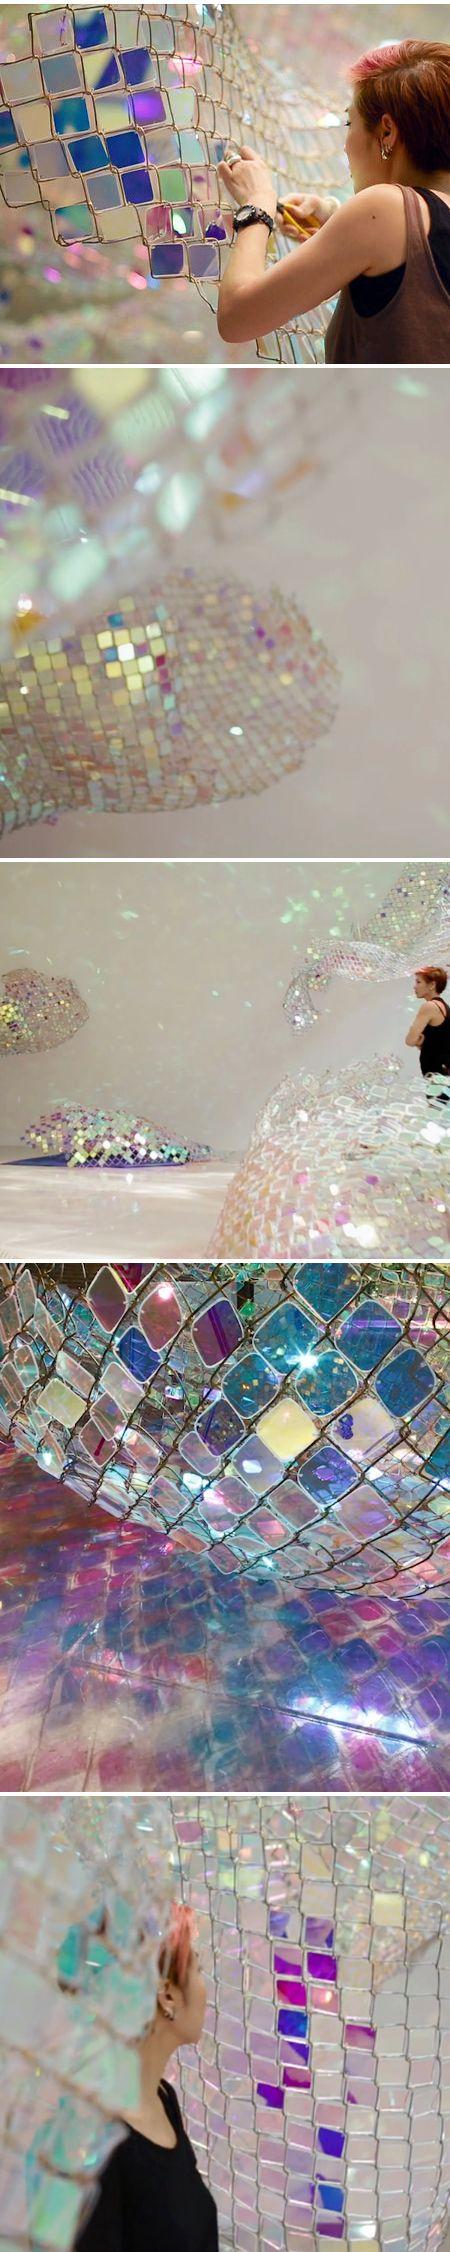 "soo sunny park - installation of ""unwoven light"" 2013"